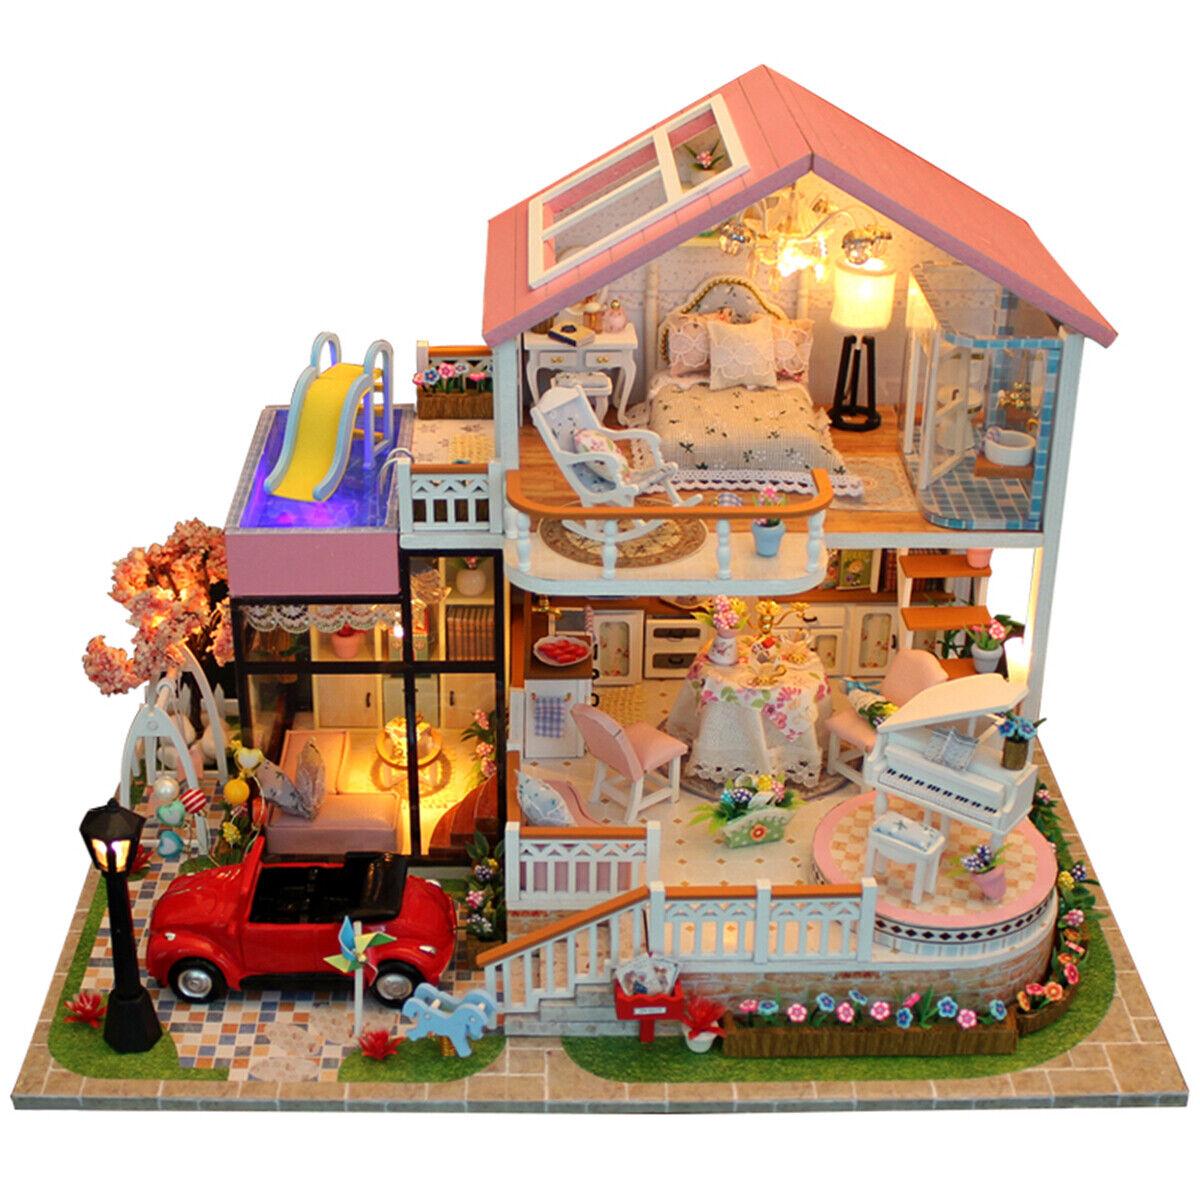 DIY Wooden Dolls House Handcraft Miniature Project Kit LED Pink Villa